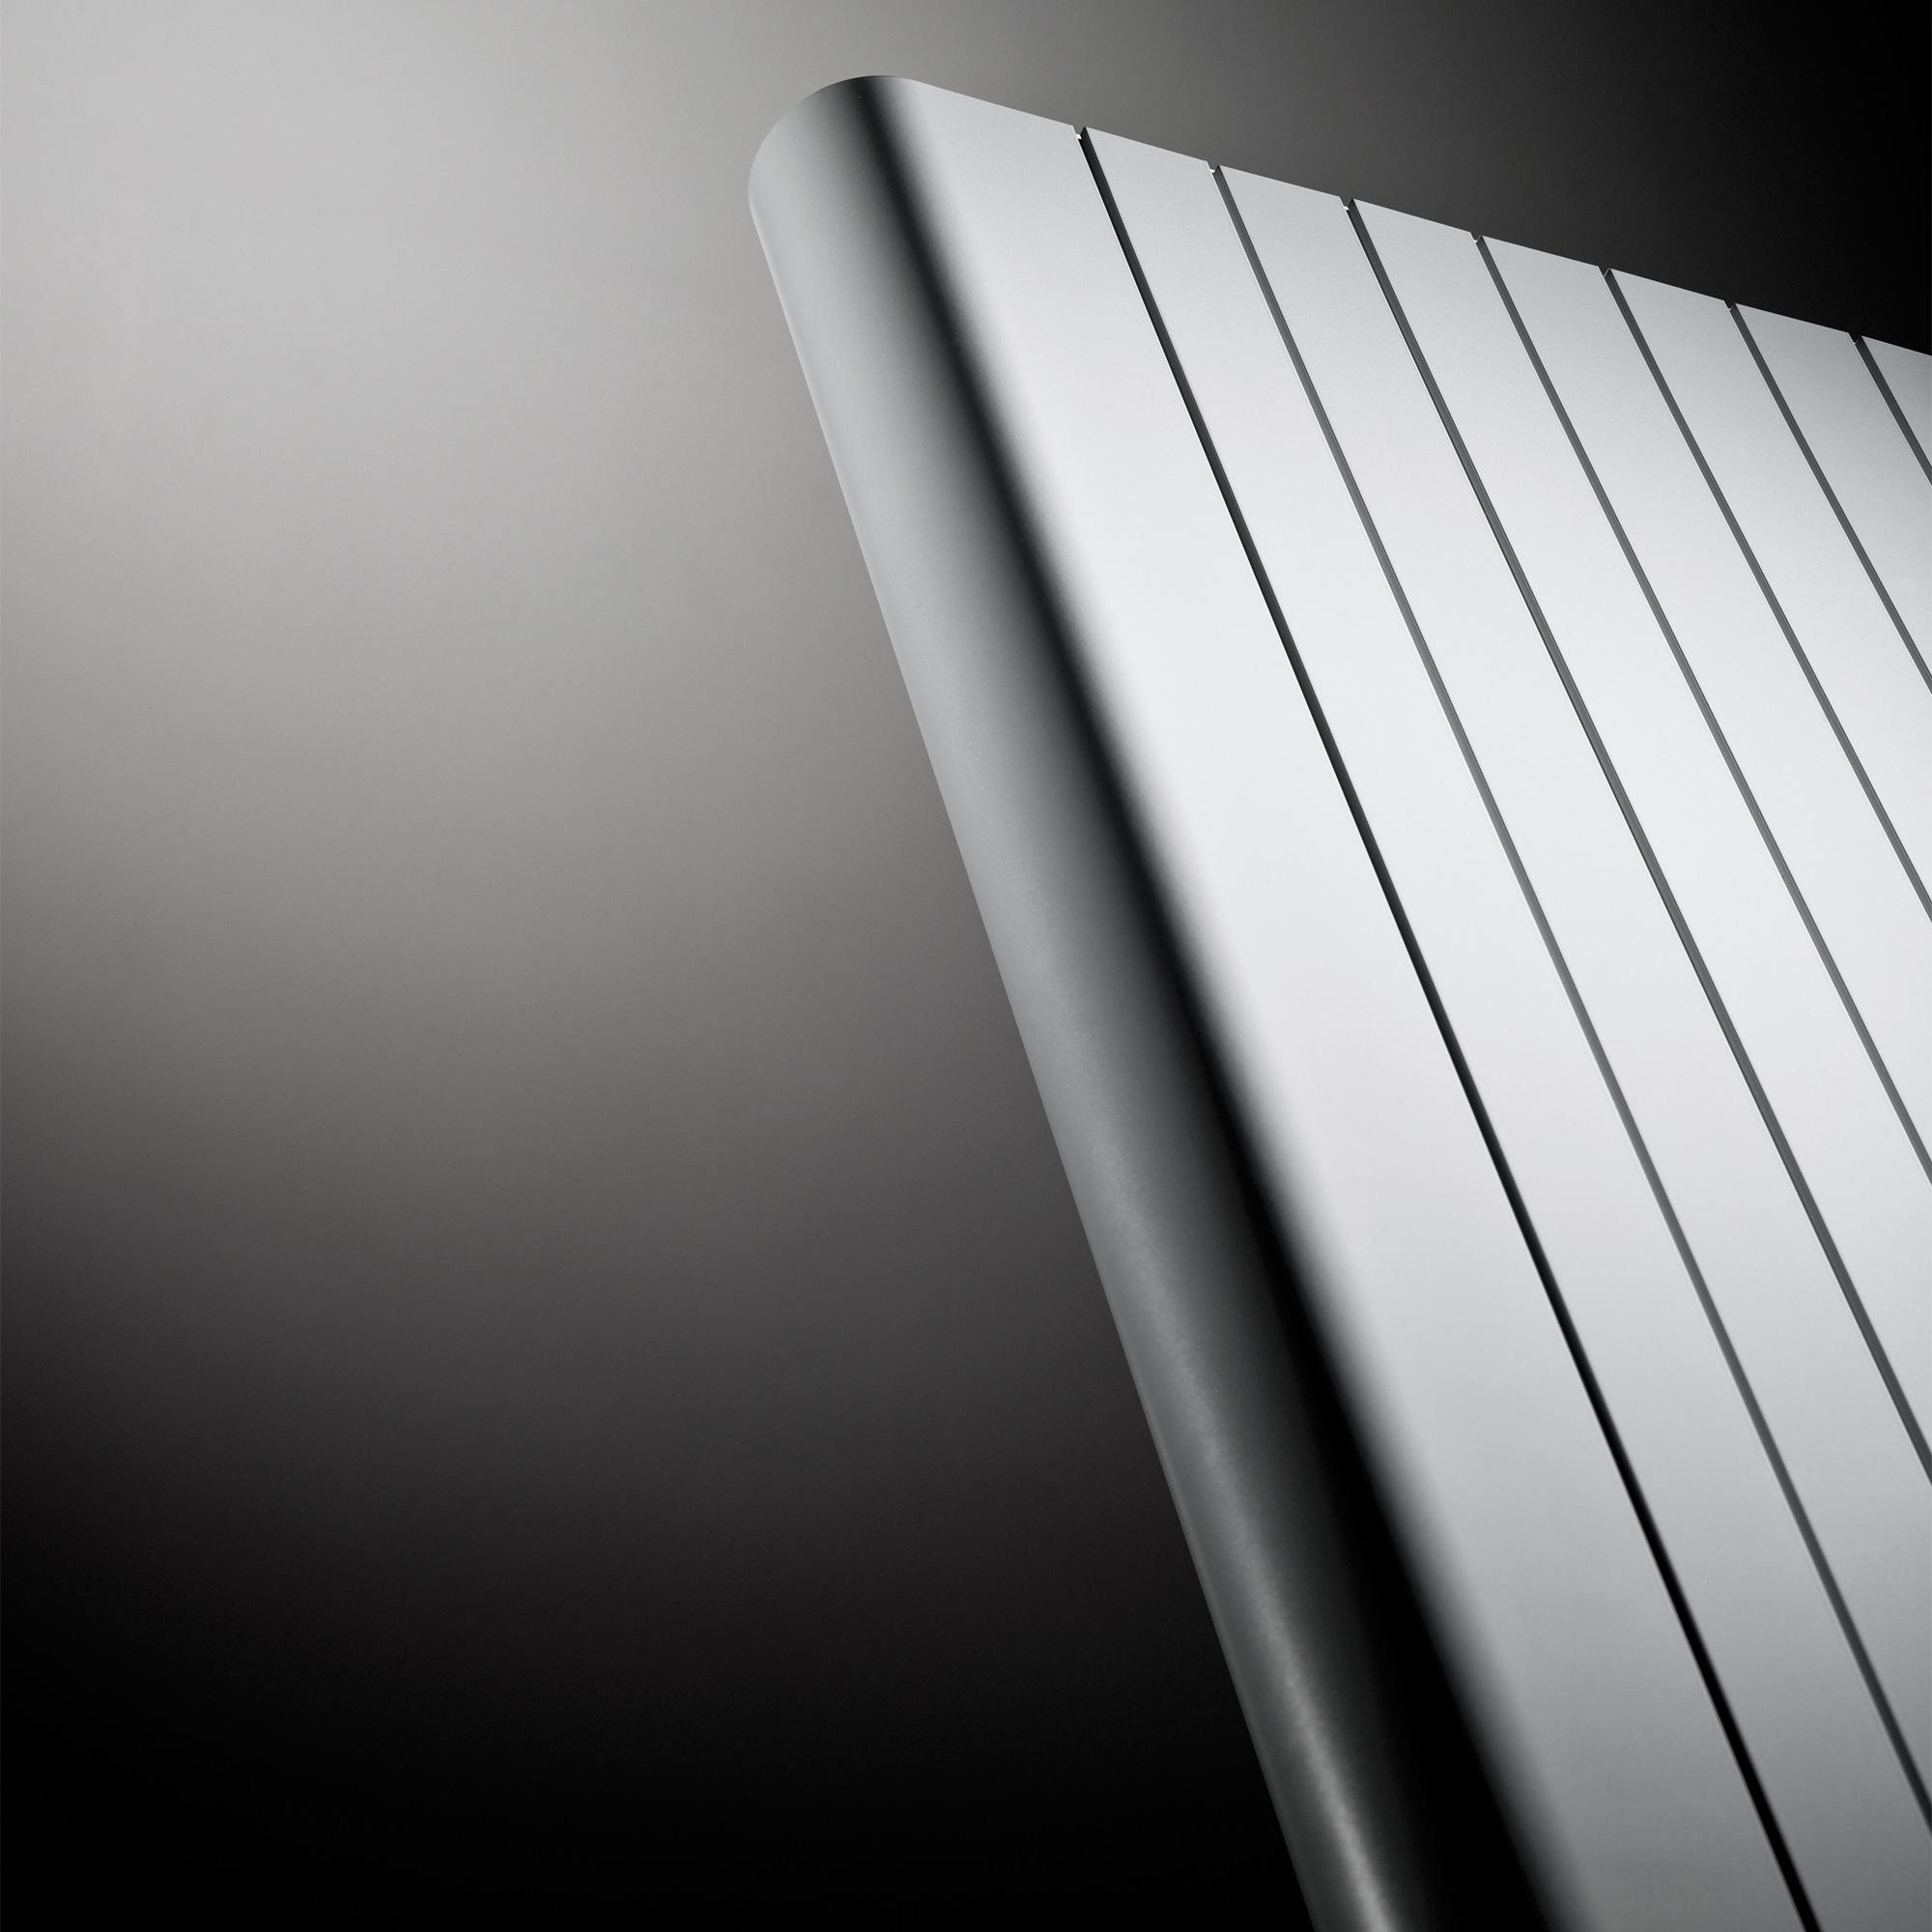 vasco alu zen vertikal heizk rper wei breite 525 mm 1874 watt 111140525180000660600 0000. Black Bedroom Furniture Sets. Home Design Ideas